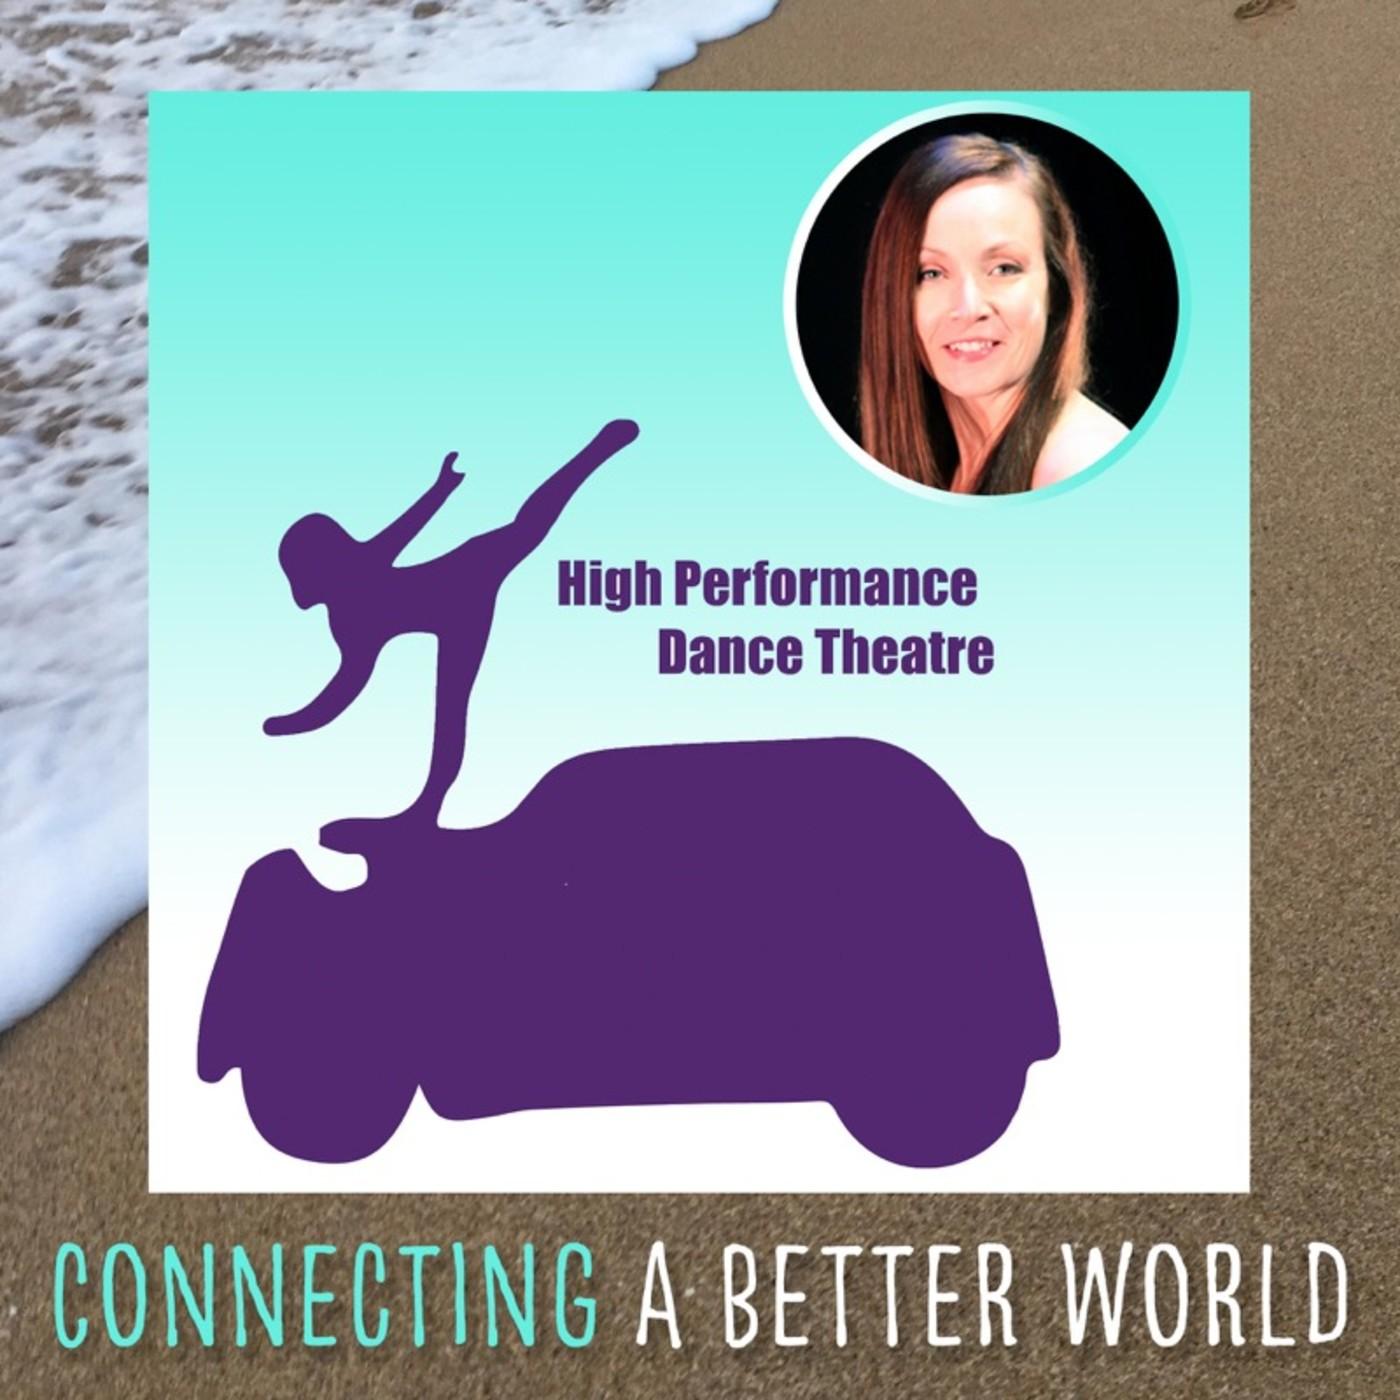 High Performance Dance Theatre